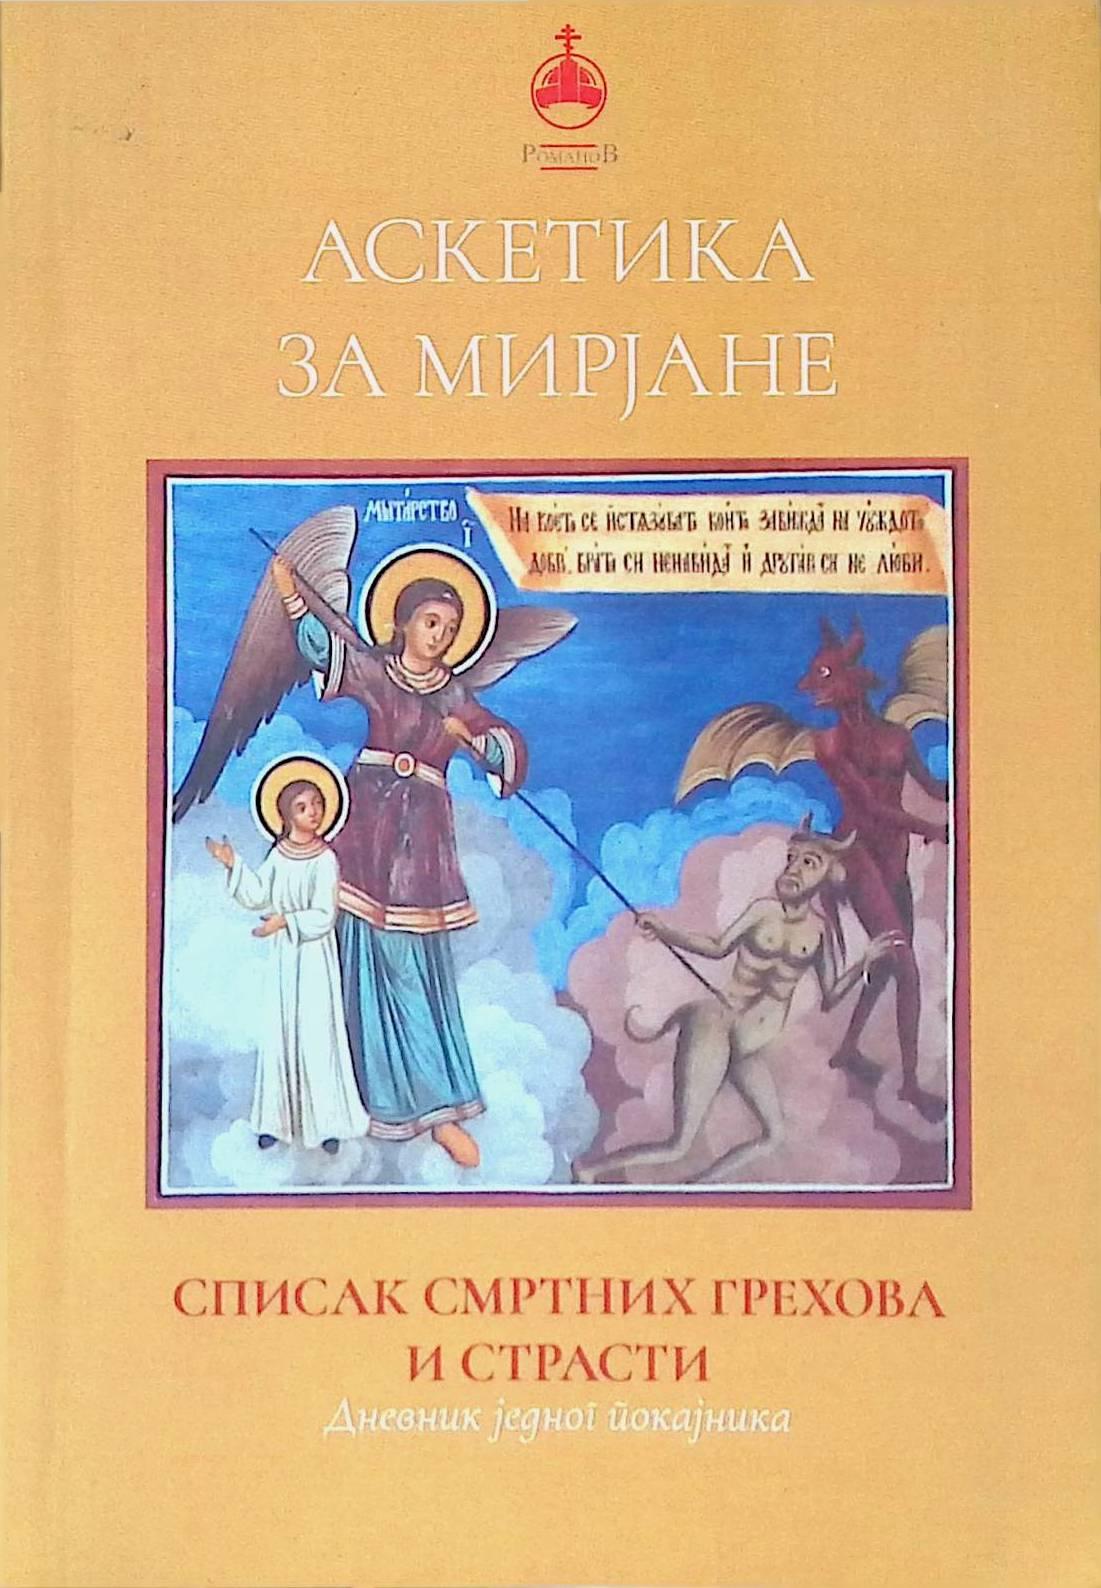 Asketika za mirjane - Spisak smrtnih grehova i strasti